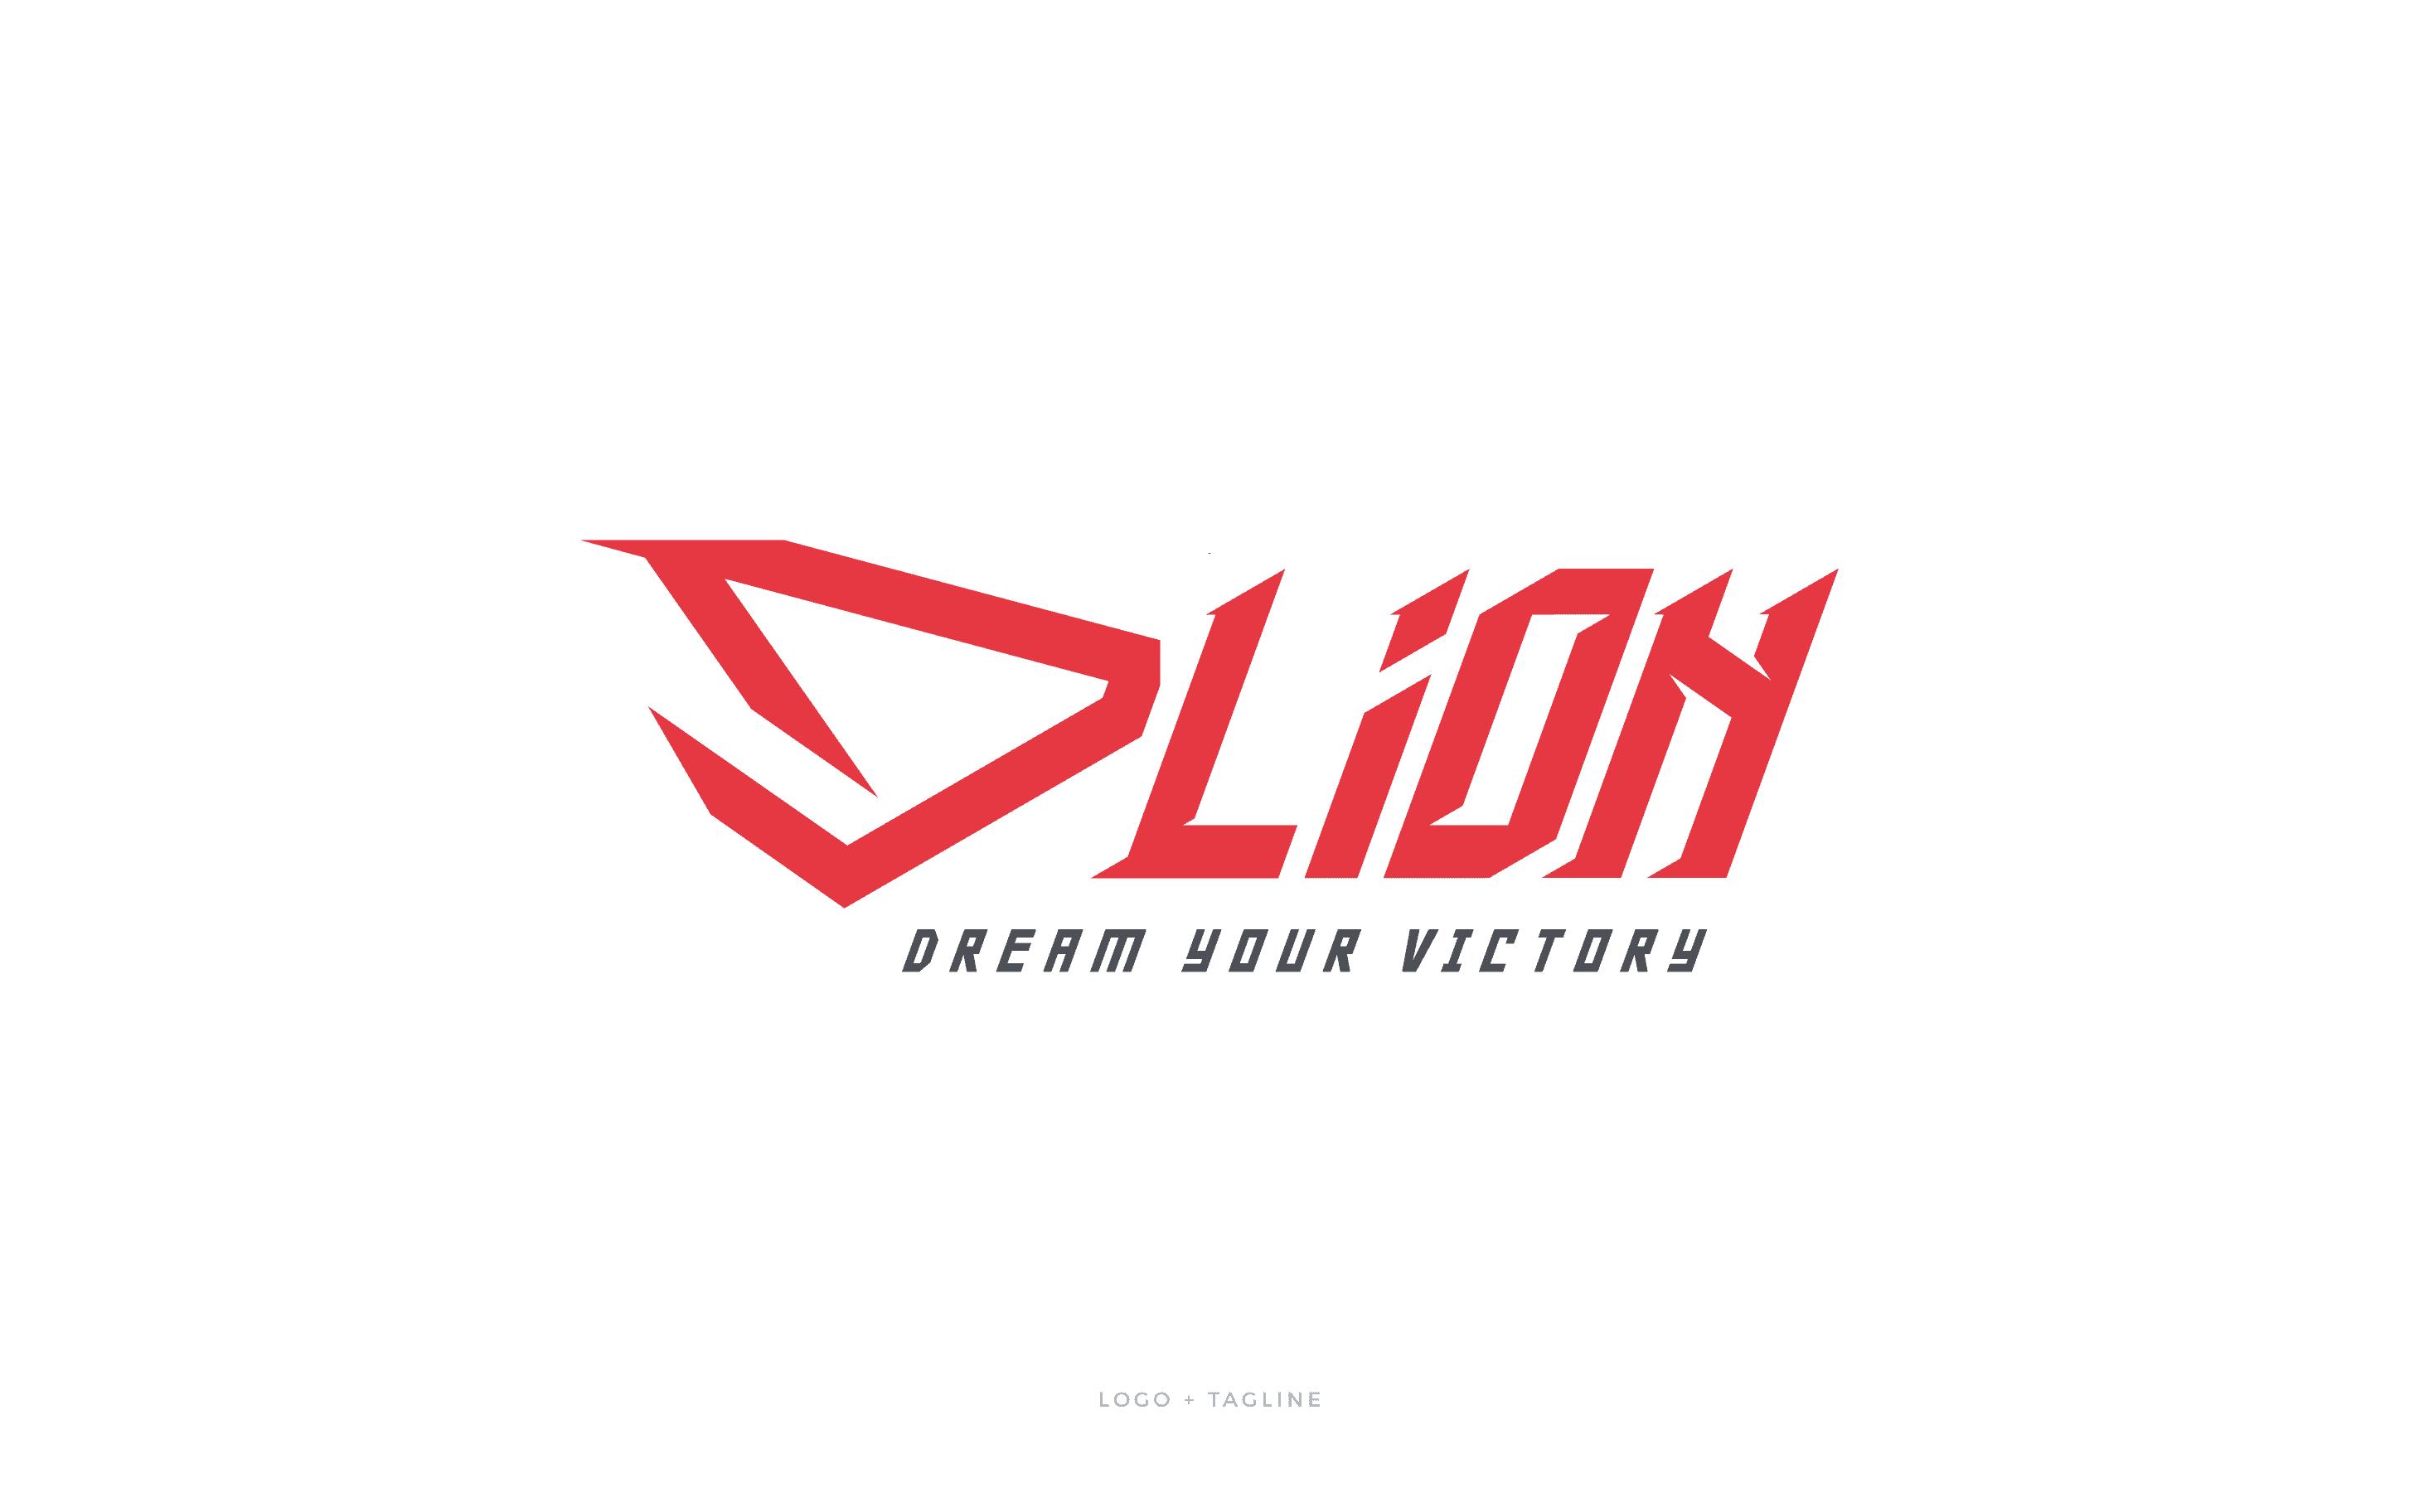 DLION Logo tagline